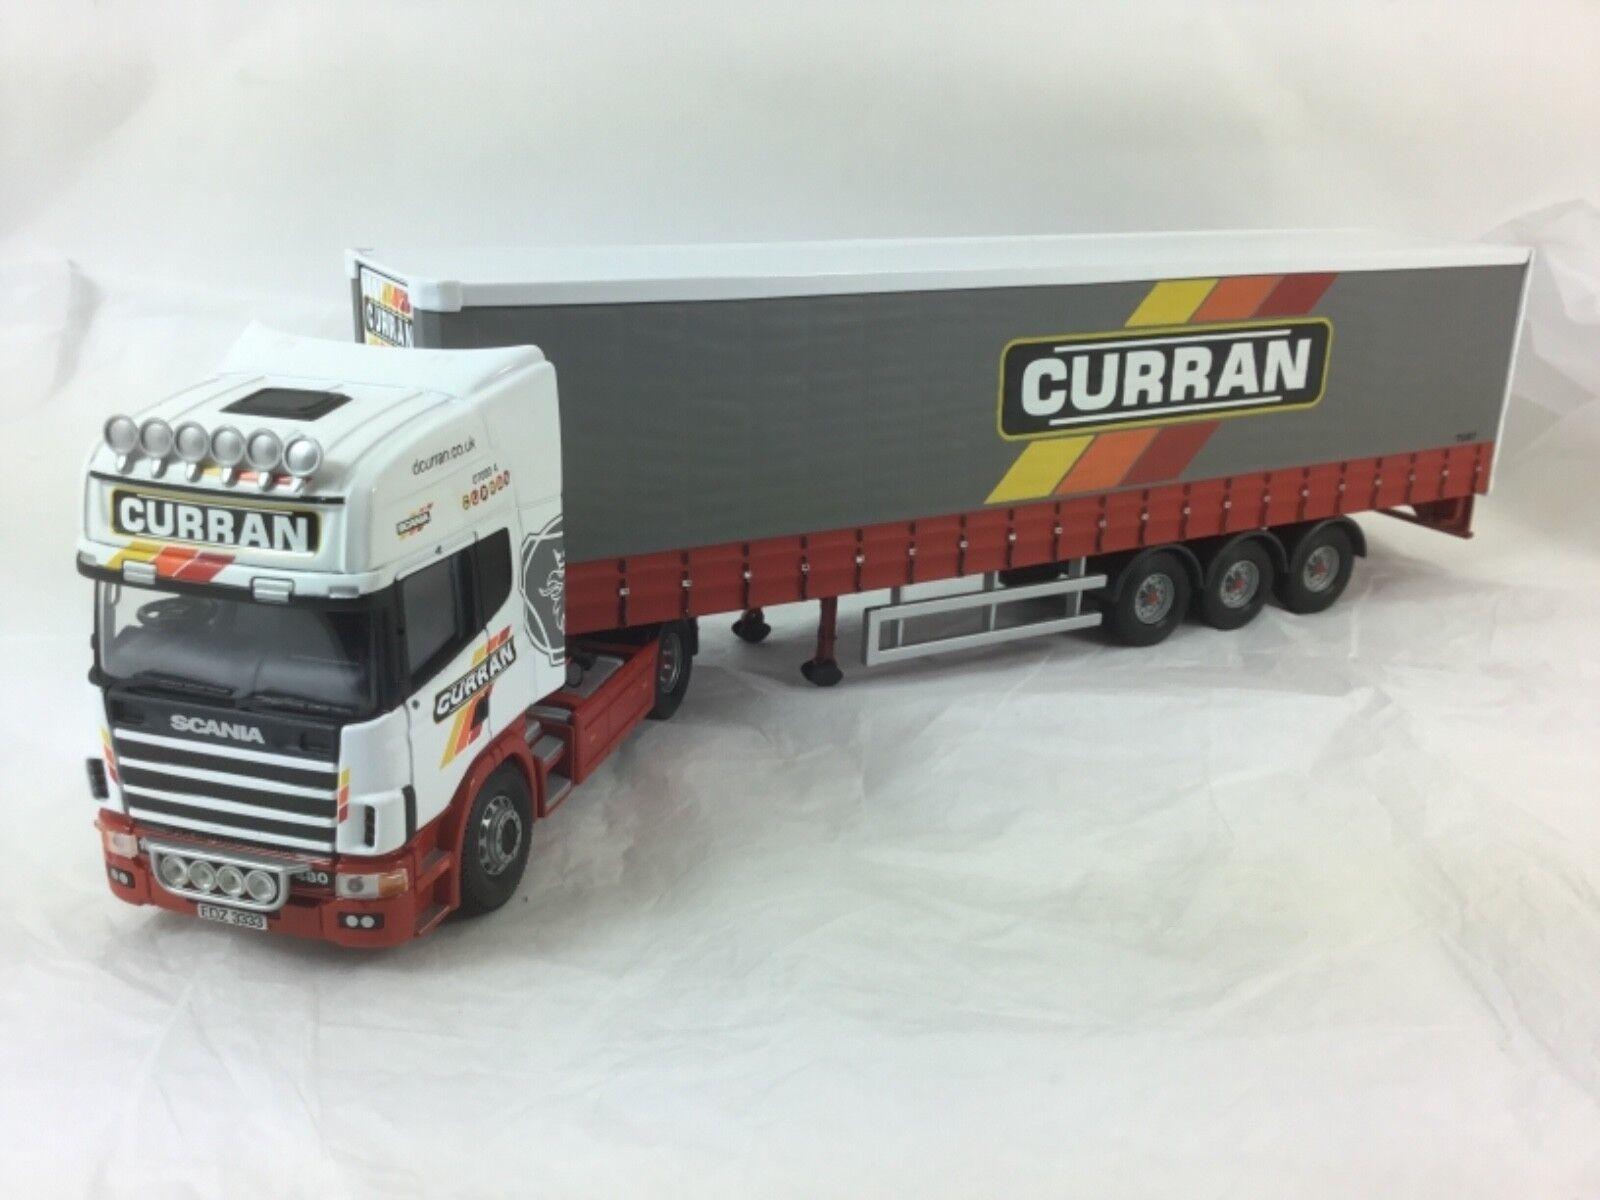 Corgi 1 50 scale CC12907 - Scania Topline Curtainside - D CURRAN & SONS LTD